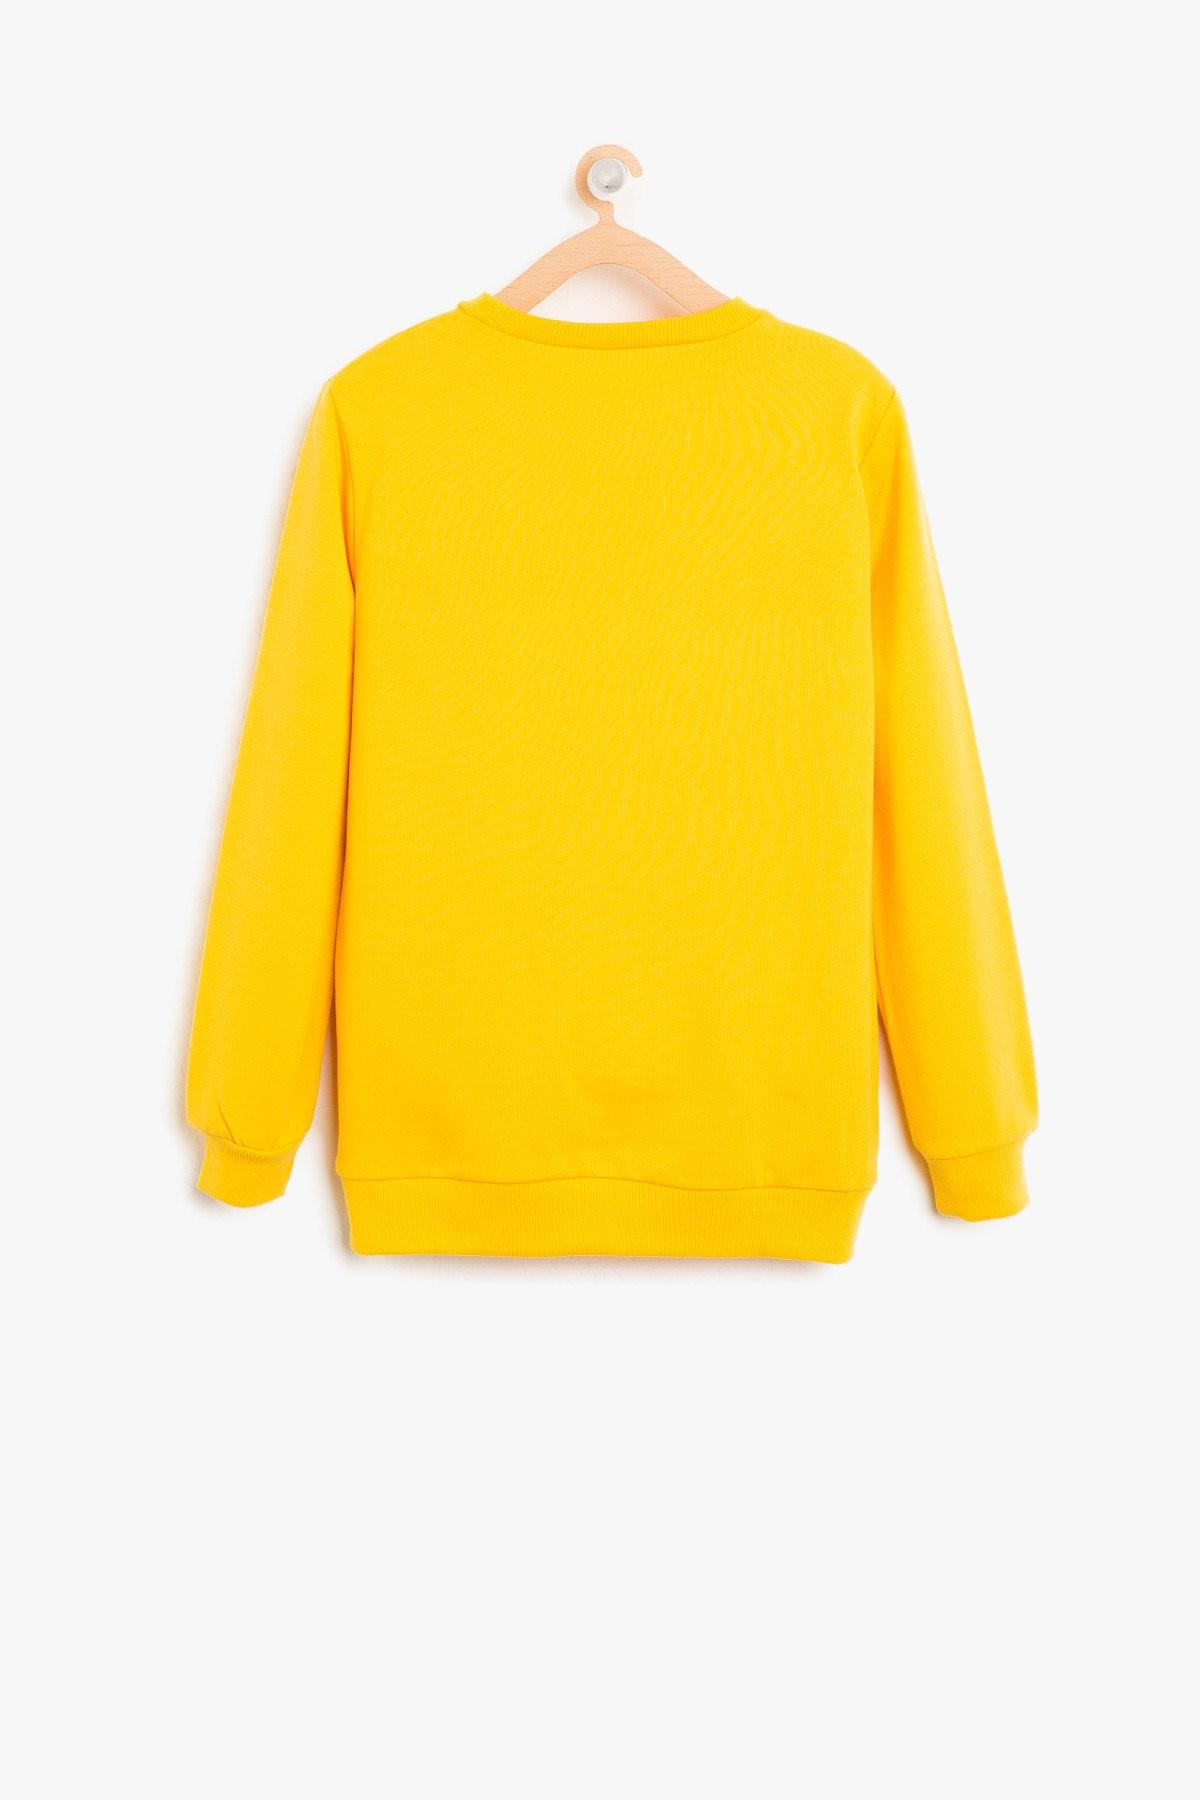 12f709e94261a Koton Çocuk Baskılı Sweatshirt 8KKB16580OK151